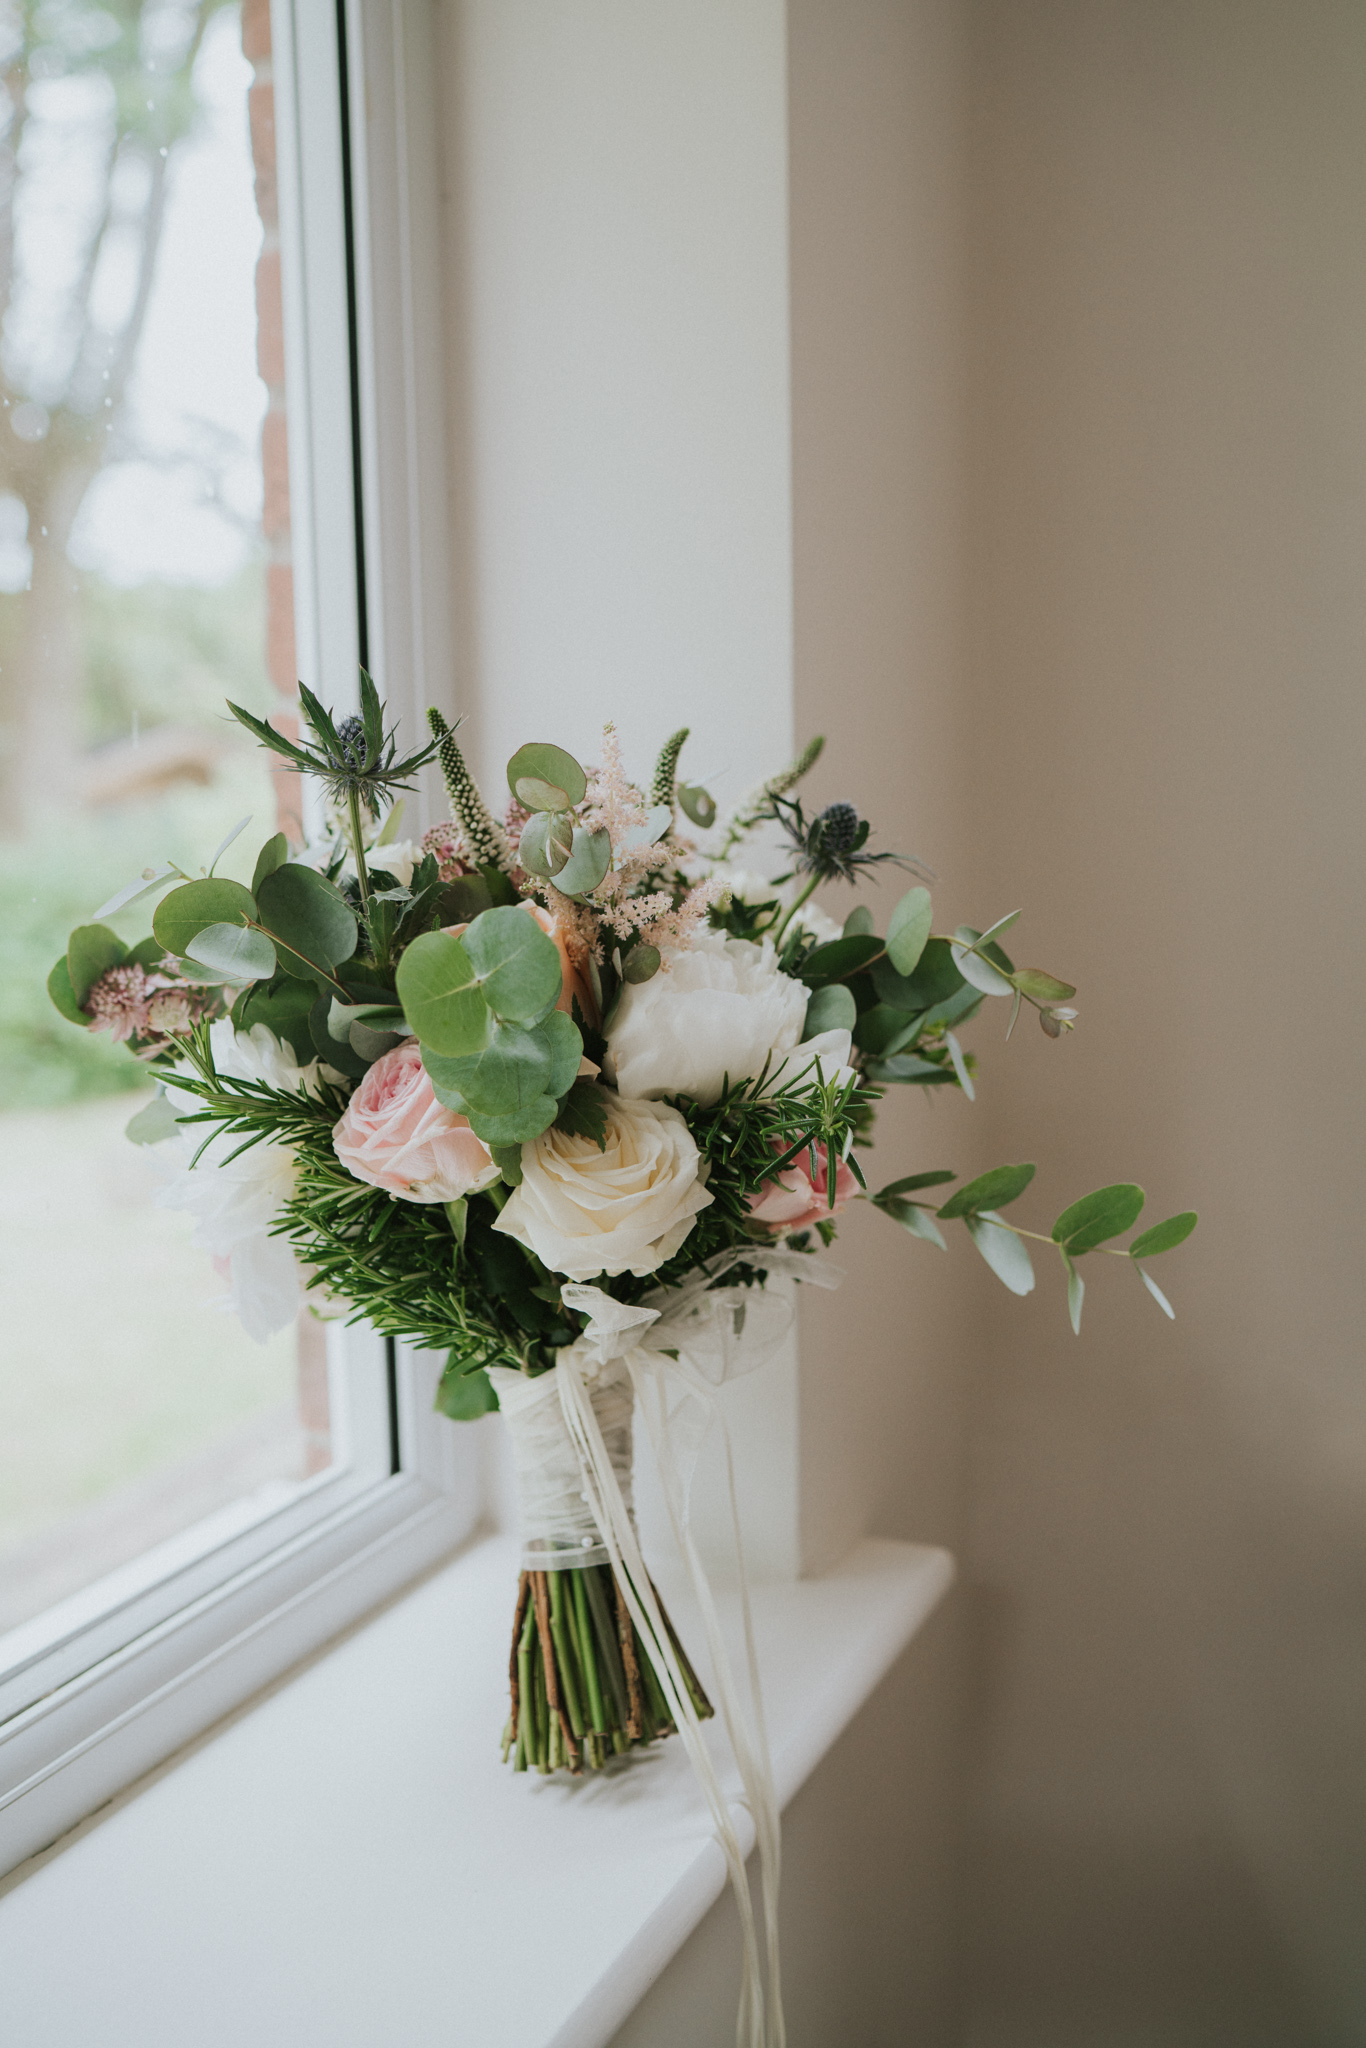 Jess-and-Tom-Norfolk-Alternative-Wedding-Essex-Wedding-Photographer-Grace-Elizabeth-6.jpg